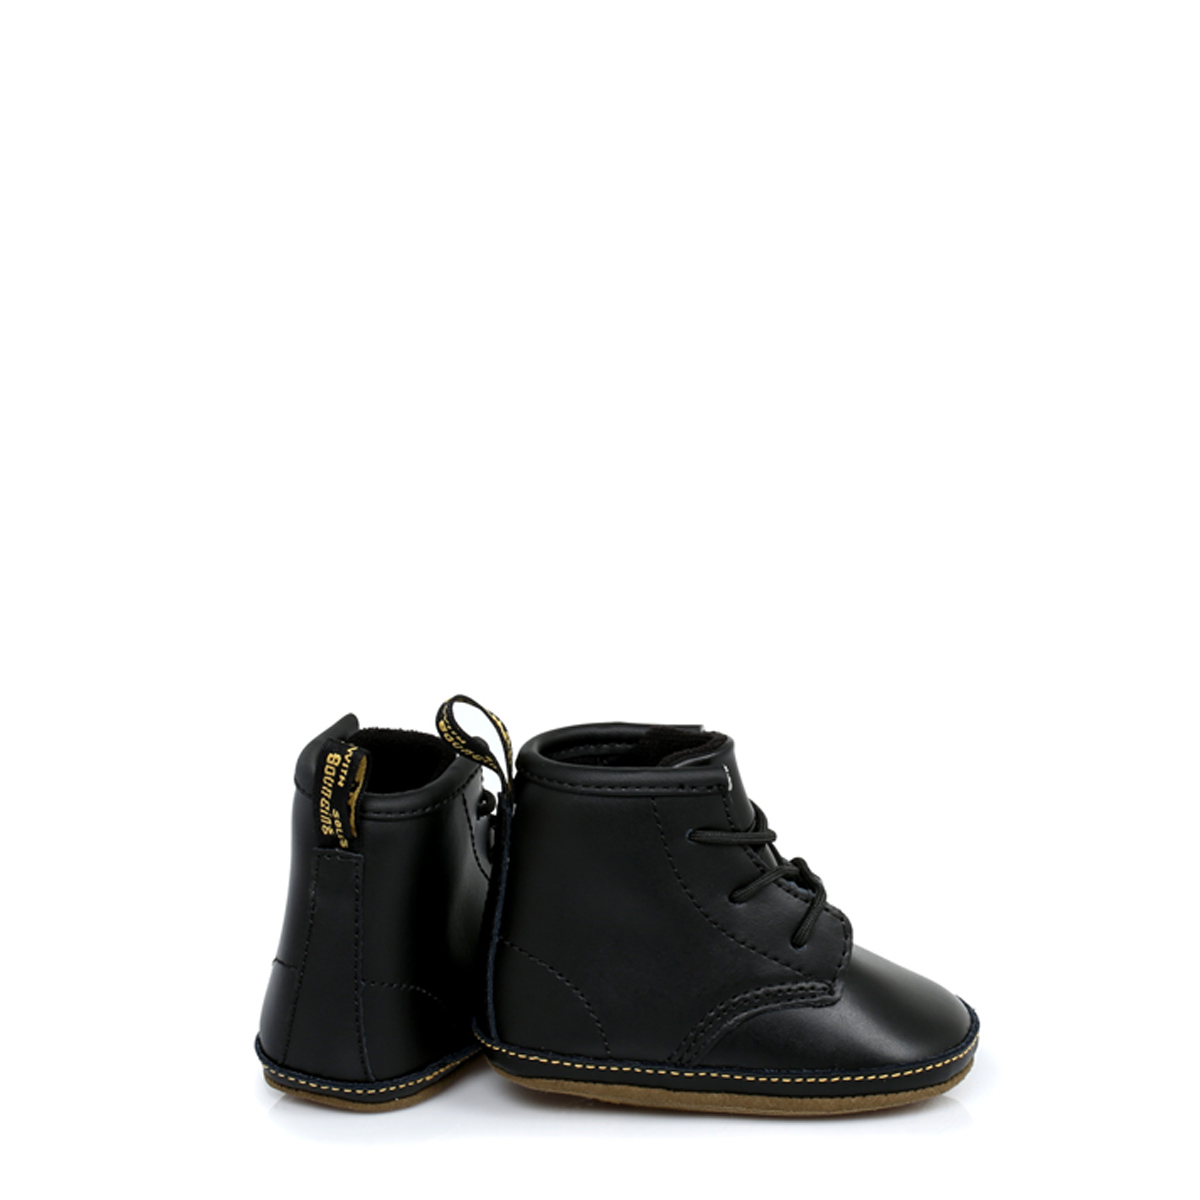 7575ba8dc9613 Dr. Martens Infant Baby Kids Boys Girls Docs Shoes Black Boots Leather Lace  Up